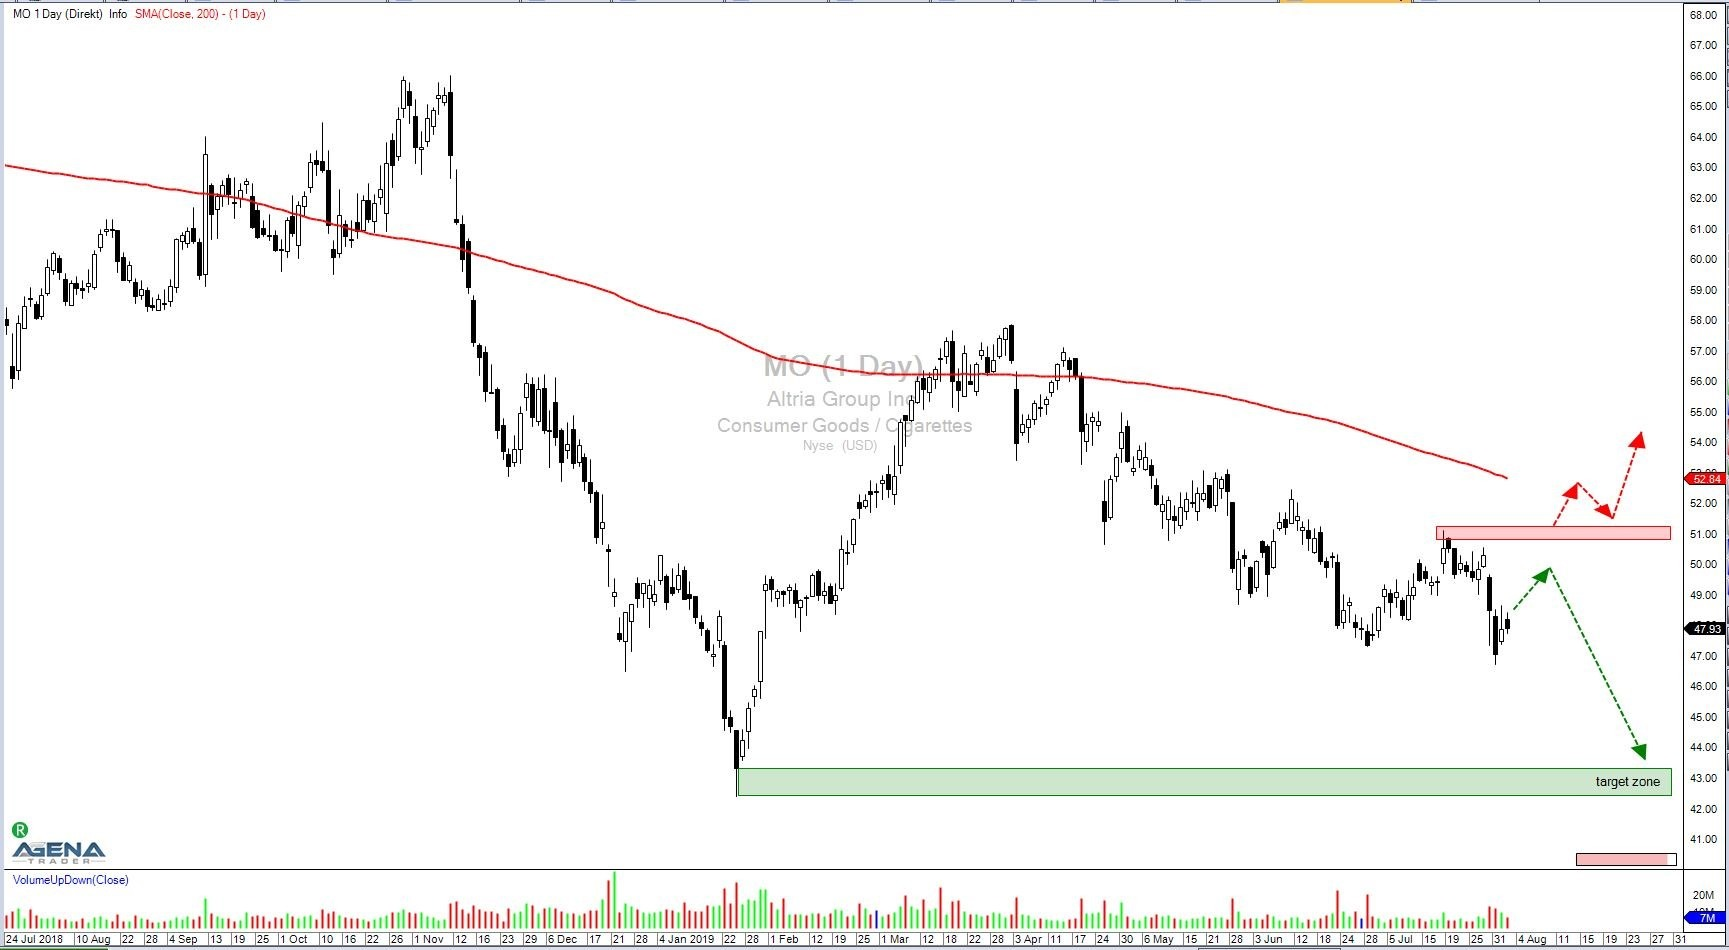 Altria Group, Inc. (MO) –  Korrektur und abwärts?